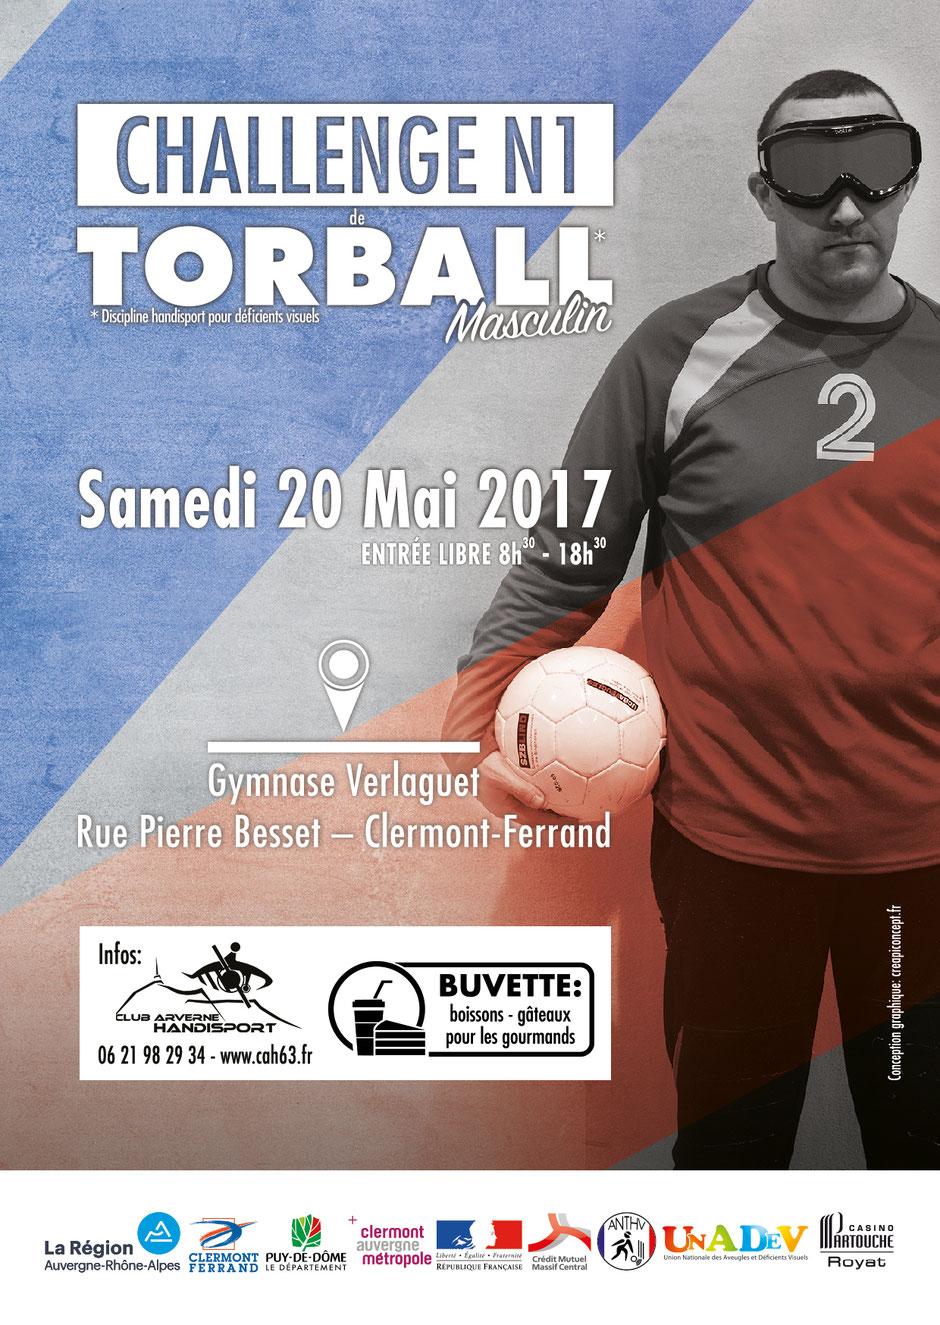 Affiche du Challenge N1 de Torball Masculin